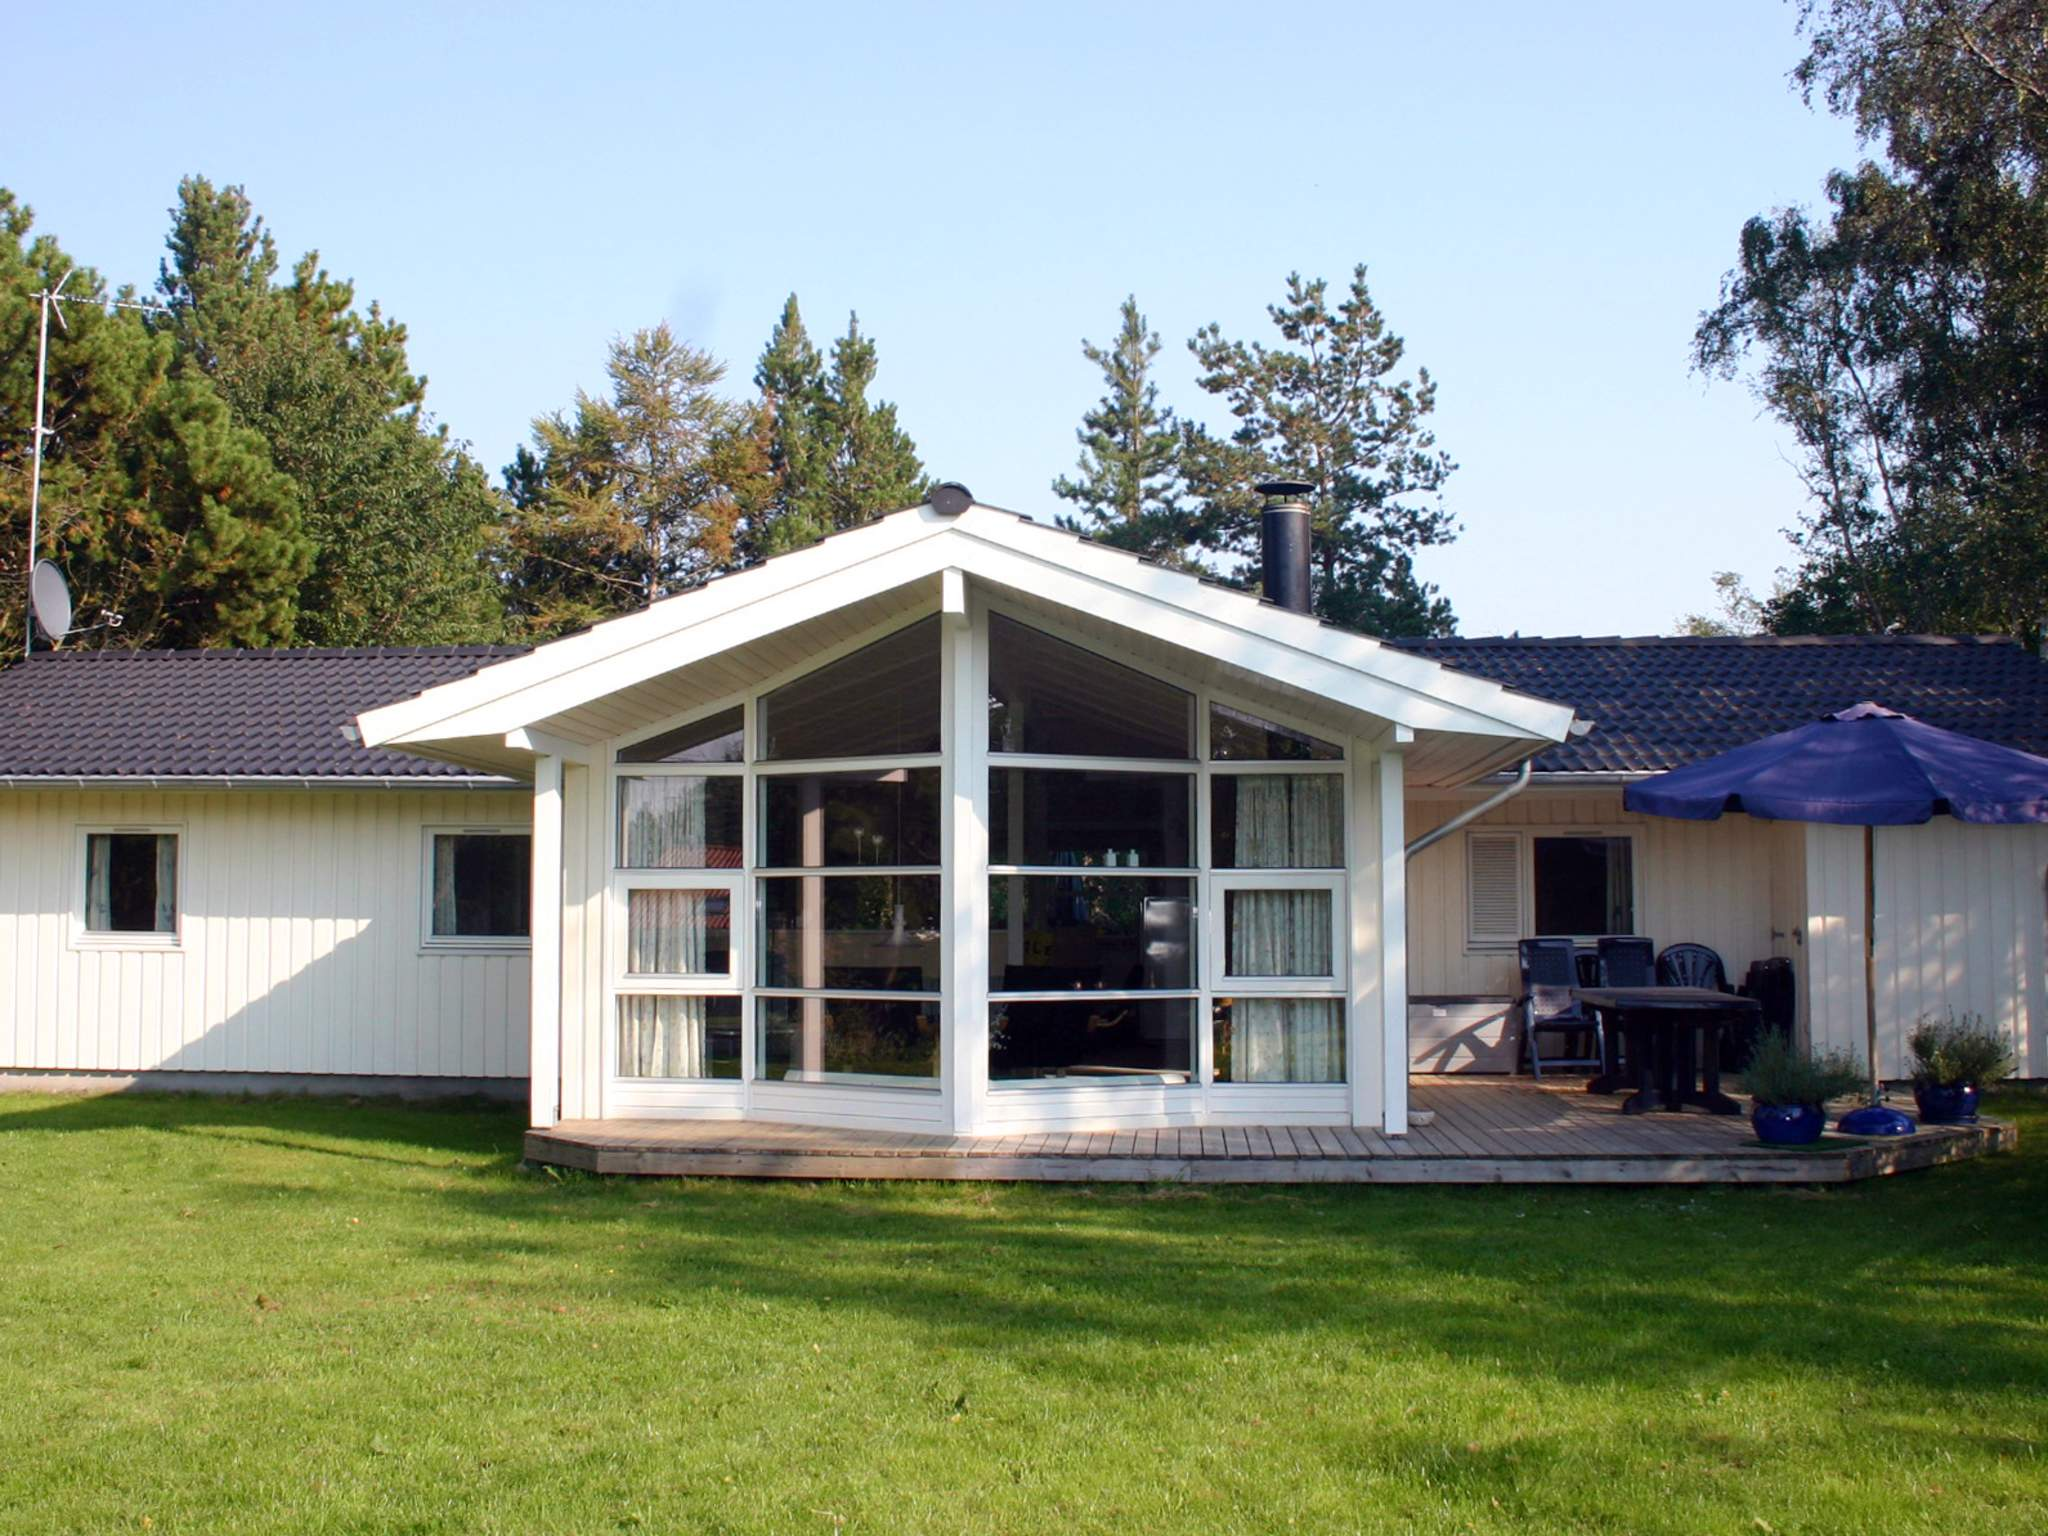 Maison de vacances Udsholt Strand (124746), Udsholt, , Seeland Nord, Danemark, image 1